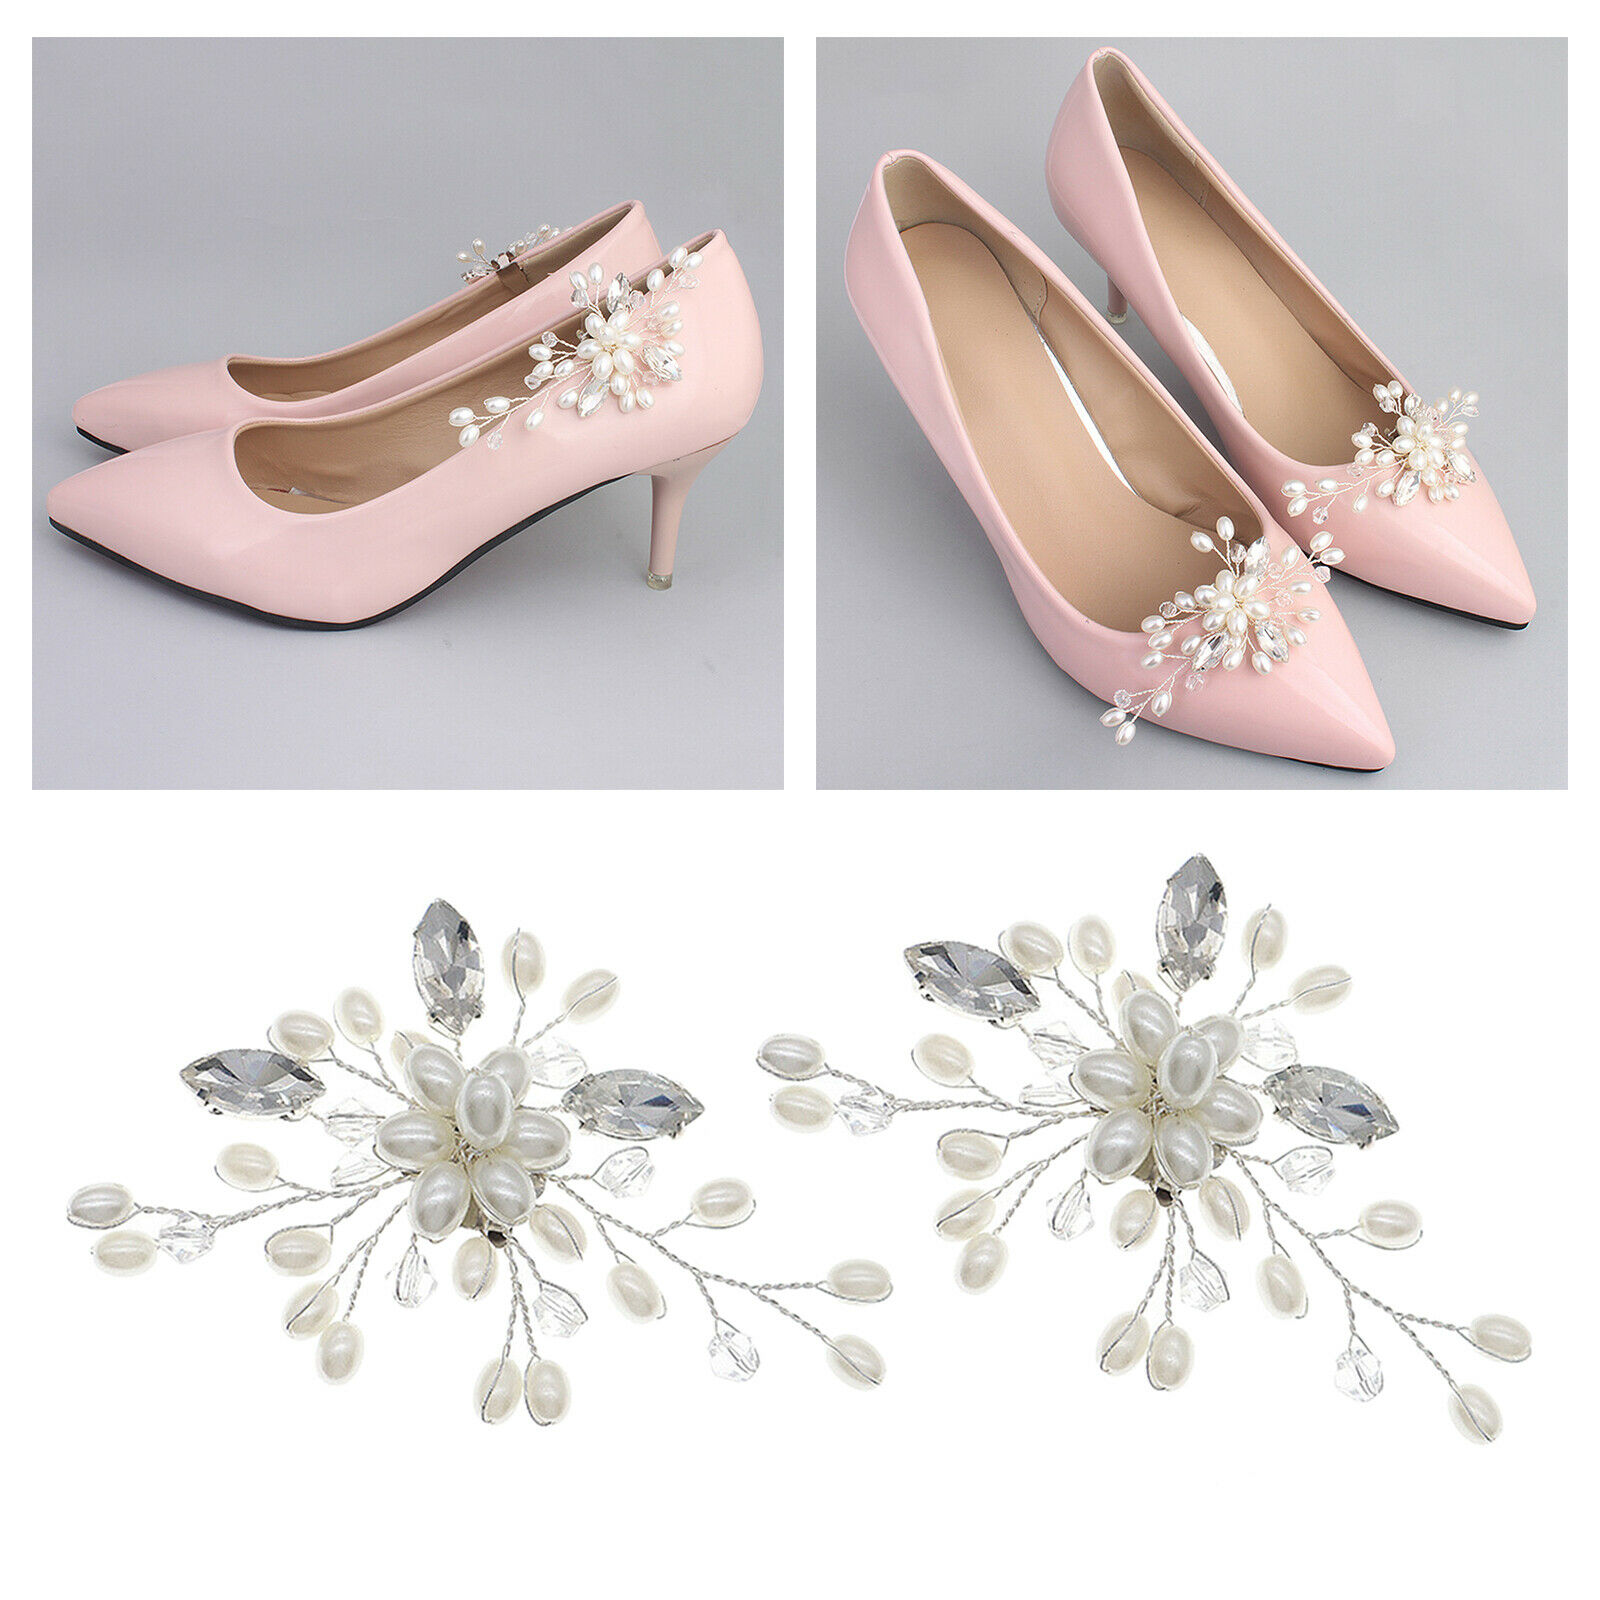 2 Packs Decorative Shoe Clips Female Bridal Shoe Charms Buckle Ornament